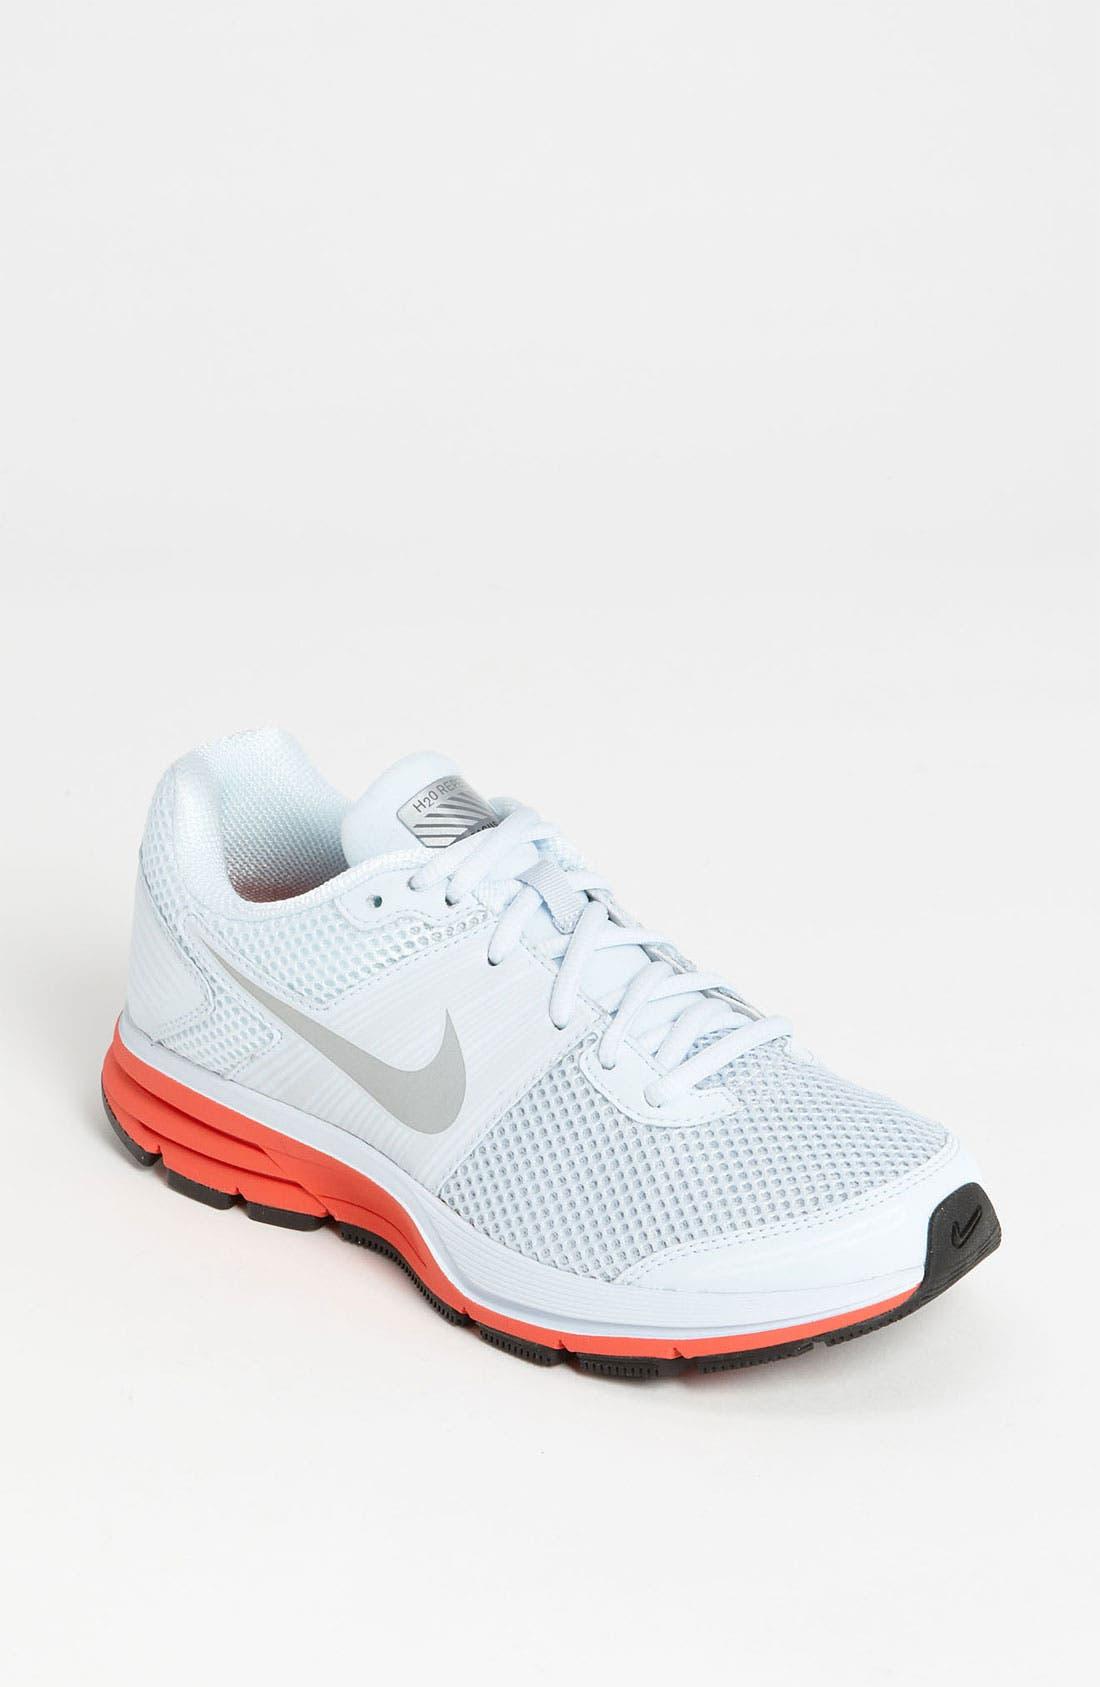 Alternate Image 1 Selected - Nike 'Air Pegasus+ 29 Shield' Running Shoe (Women)